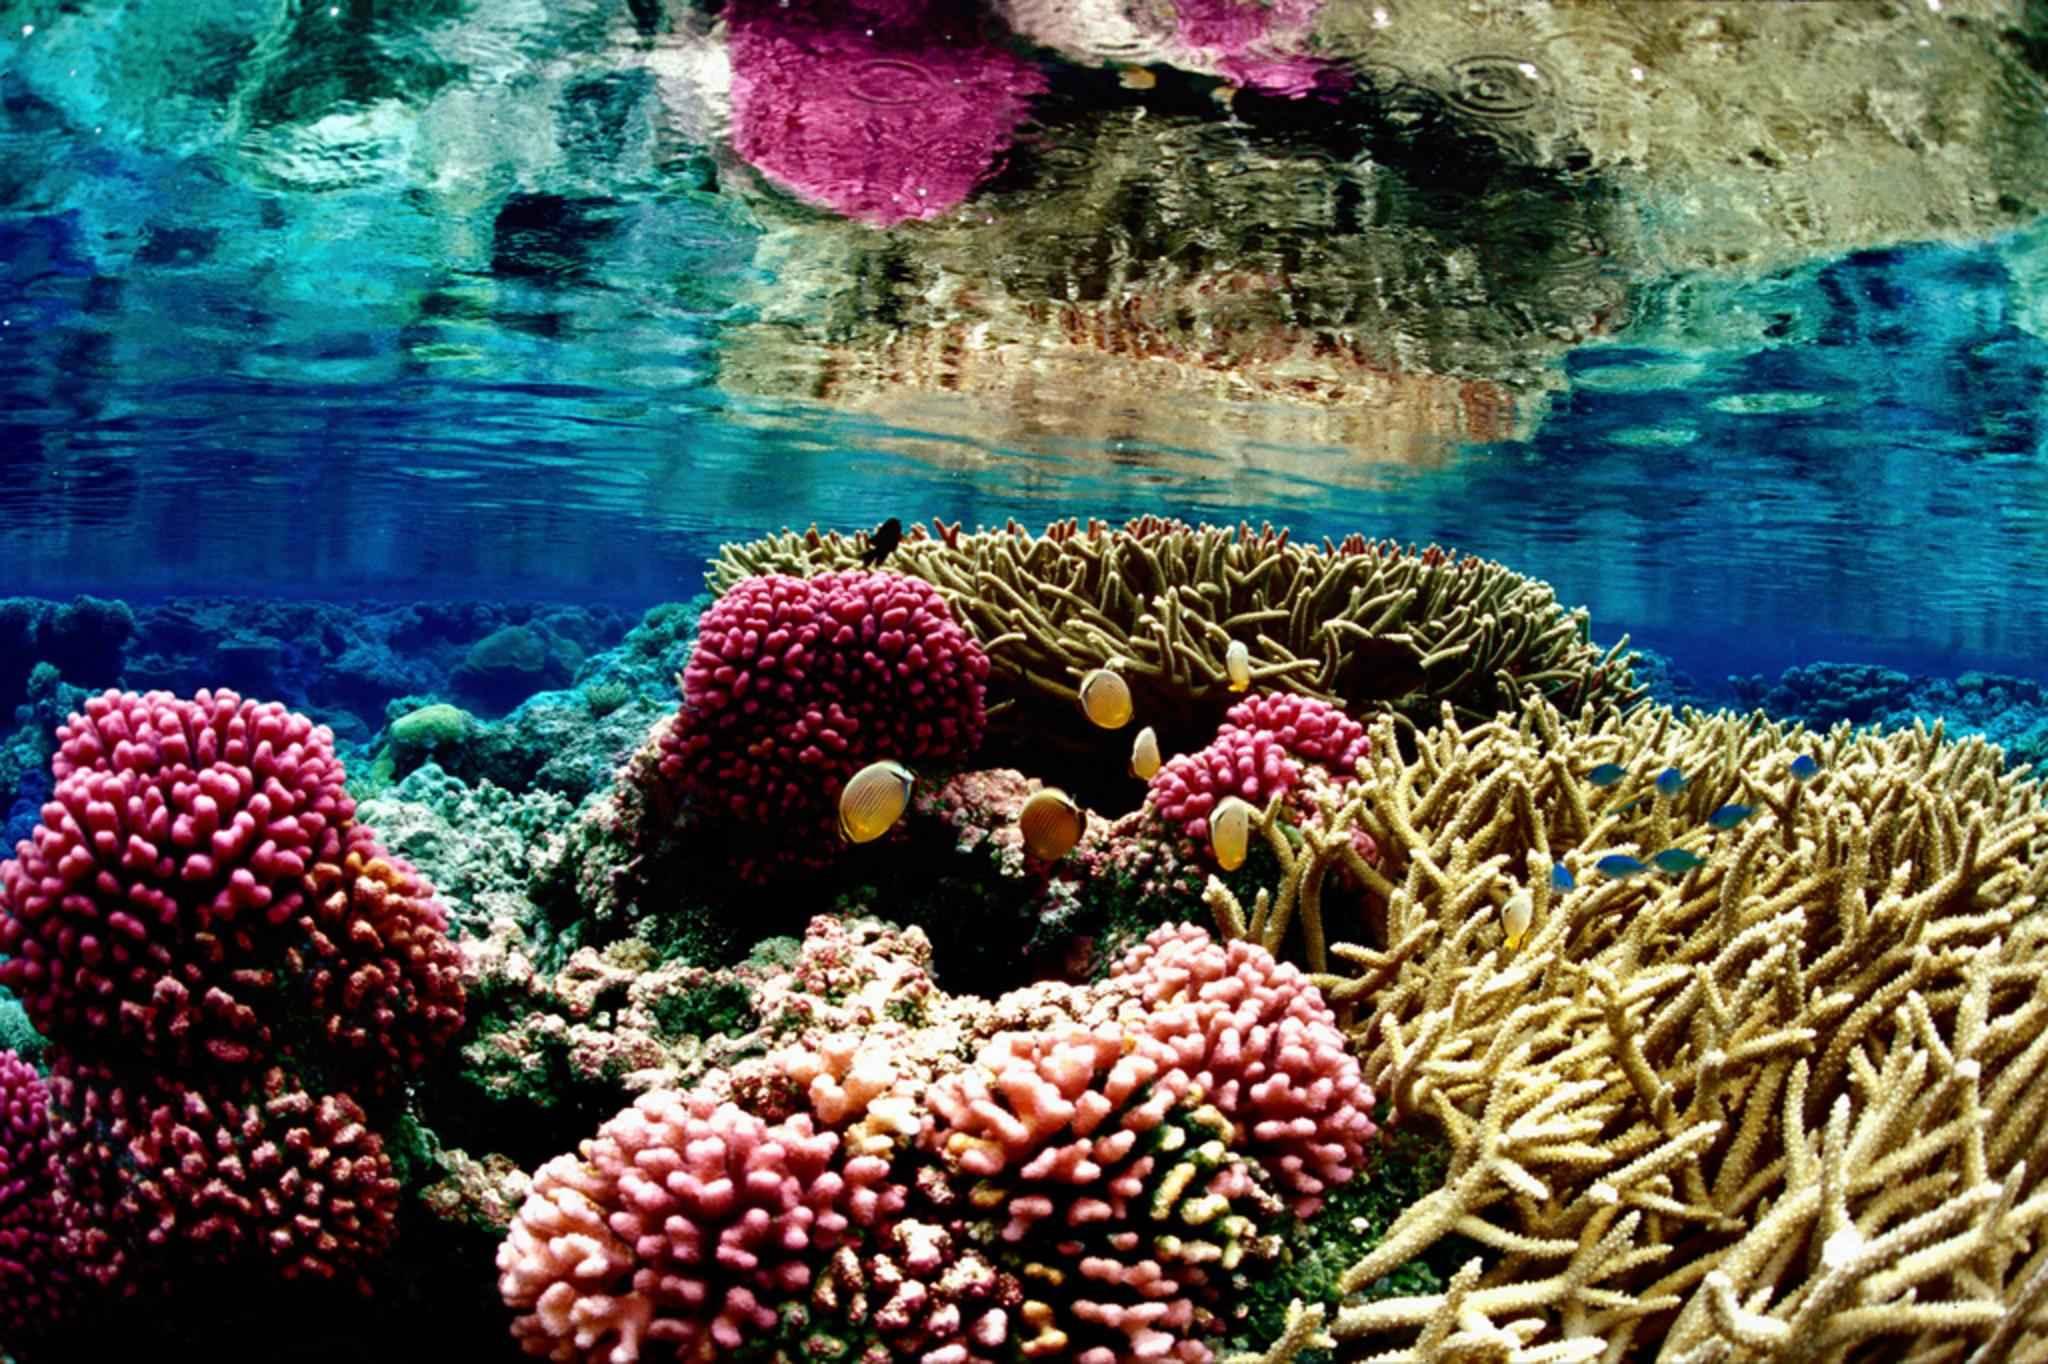 3D Printed Coral Reefs Help Scientists Analyse Environmental Damage